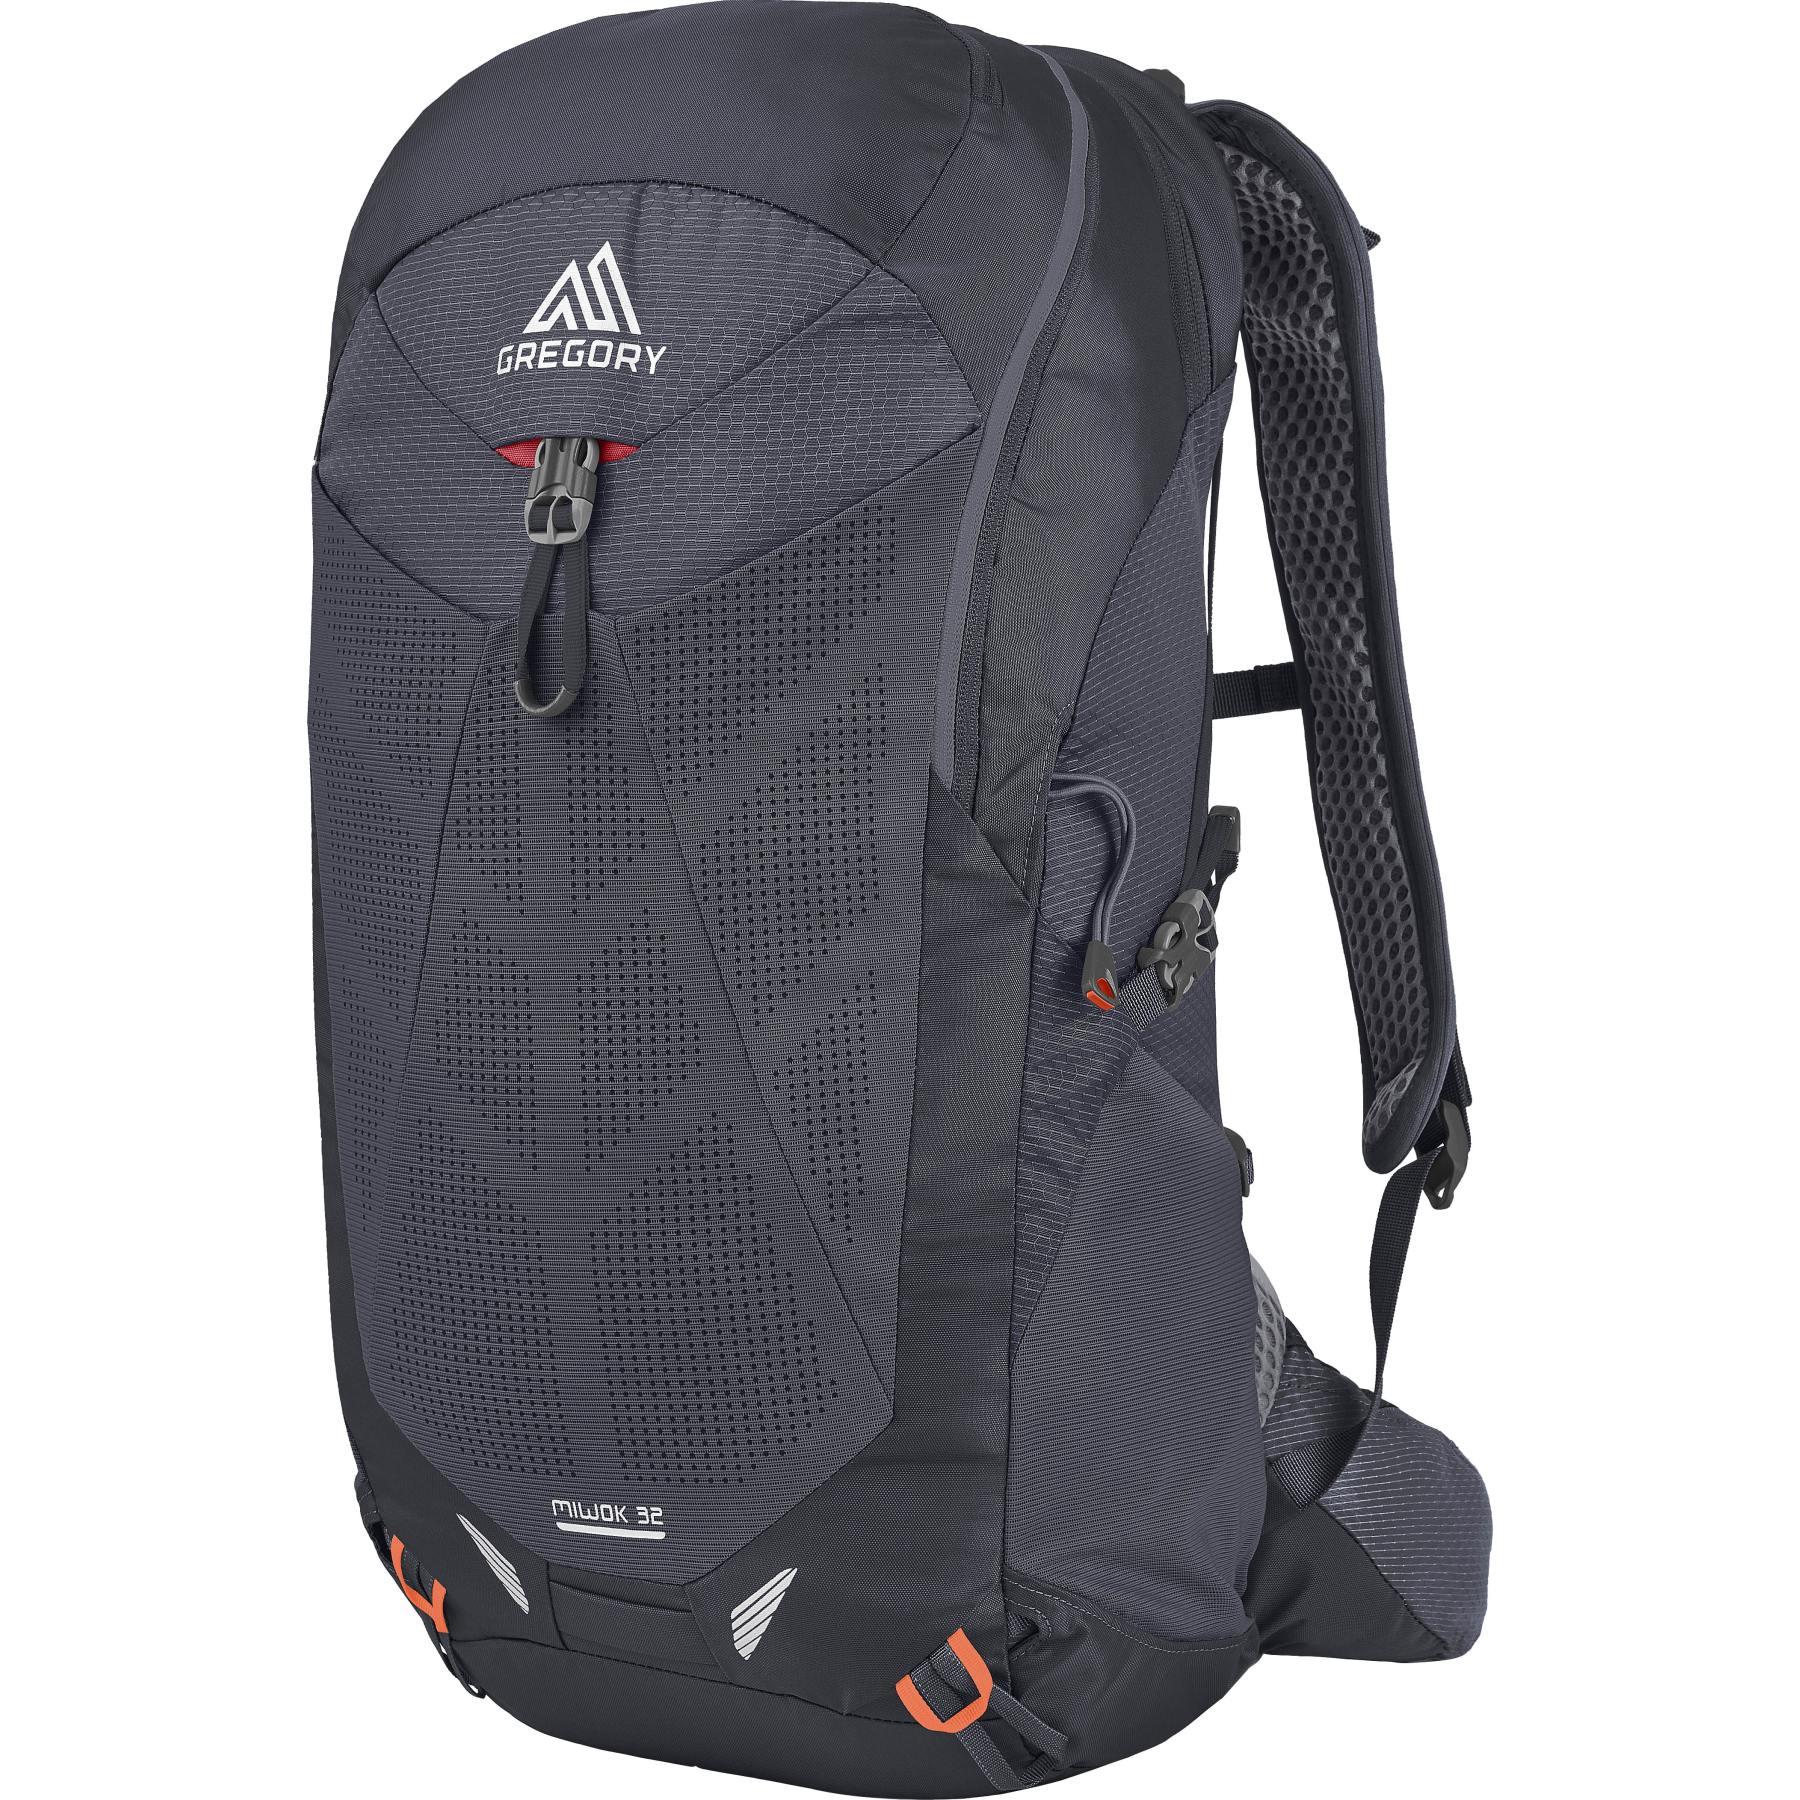 Gregory Miwok 32 Backpack - Flame Black